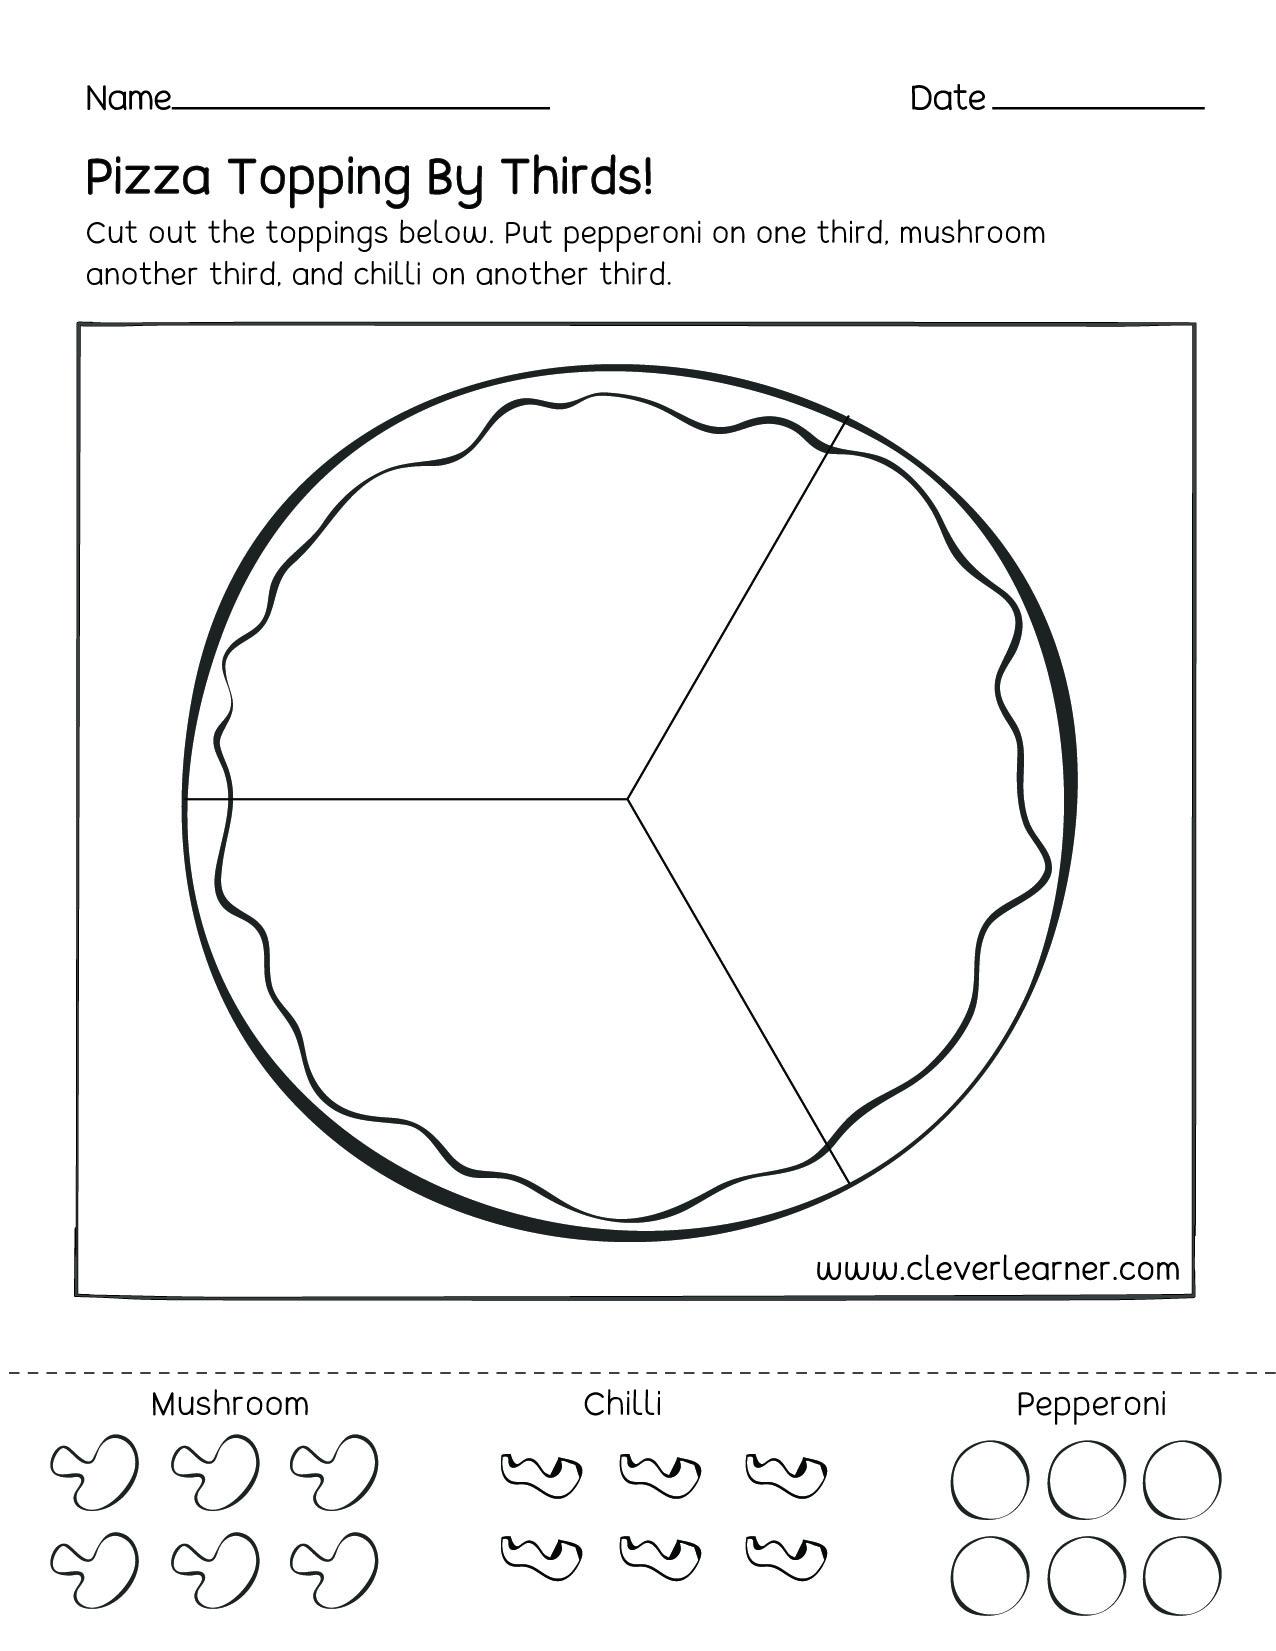 Pizza Toppings Worksheet Printable